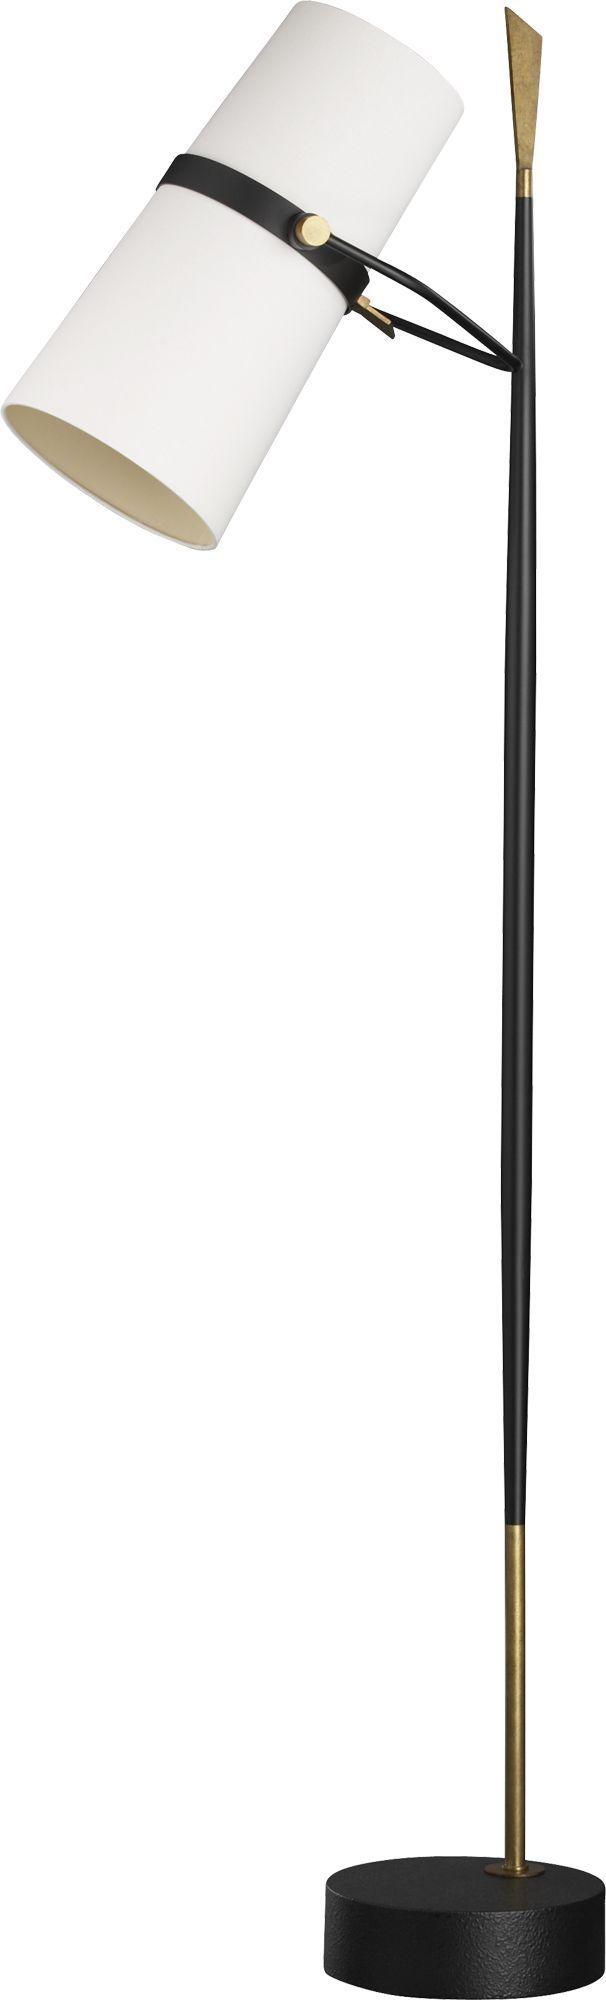 Riston Floor Lamp | Floor lamp, Contemporary floor lamps ... on Riston Floor Lamp  id=58282